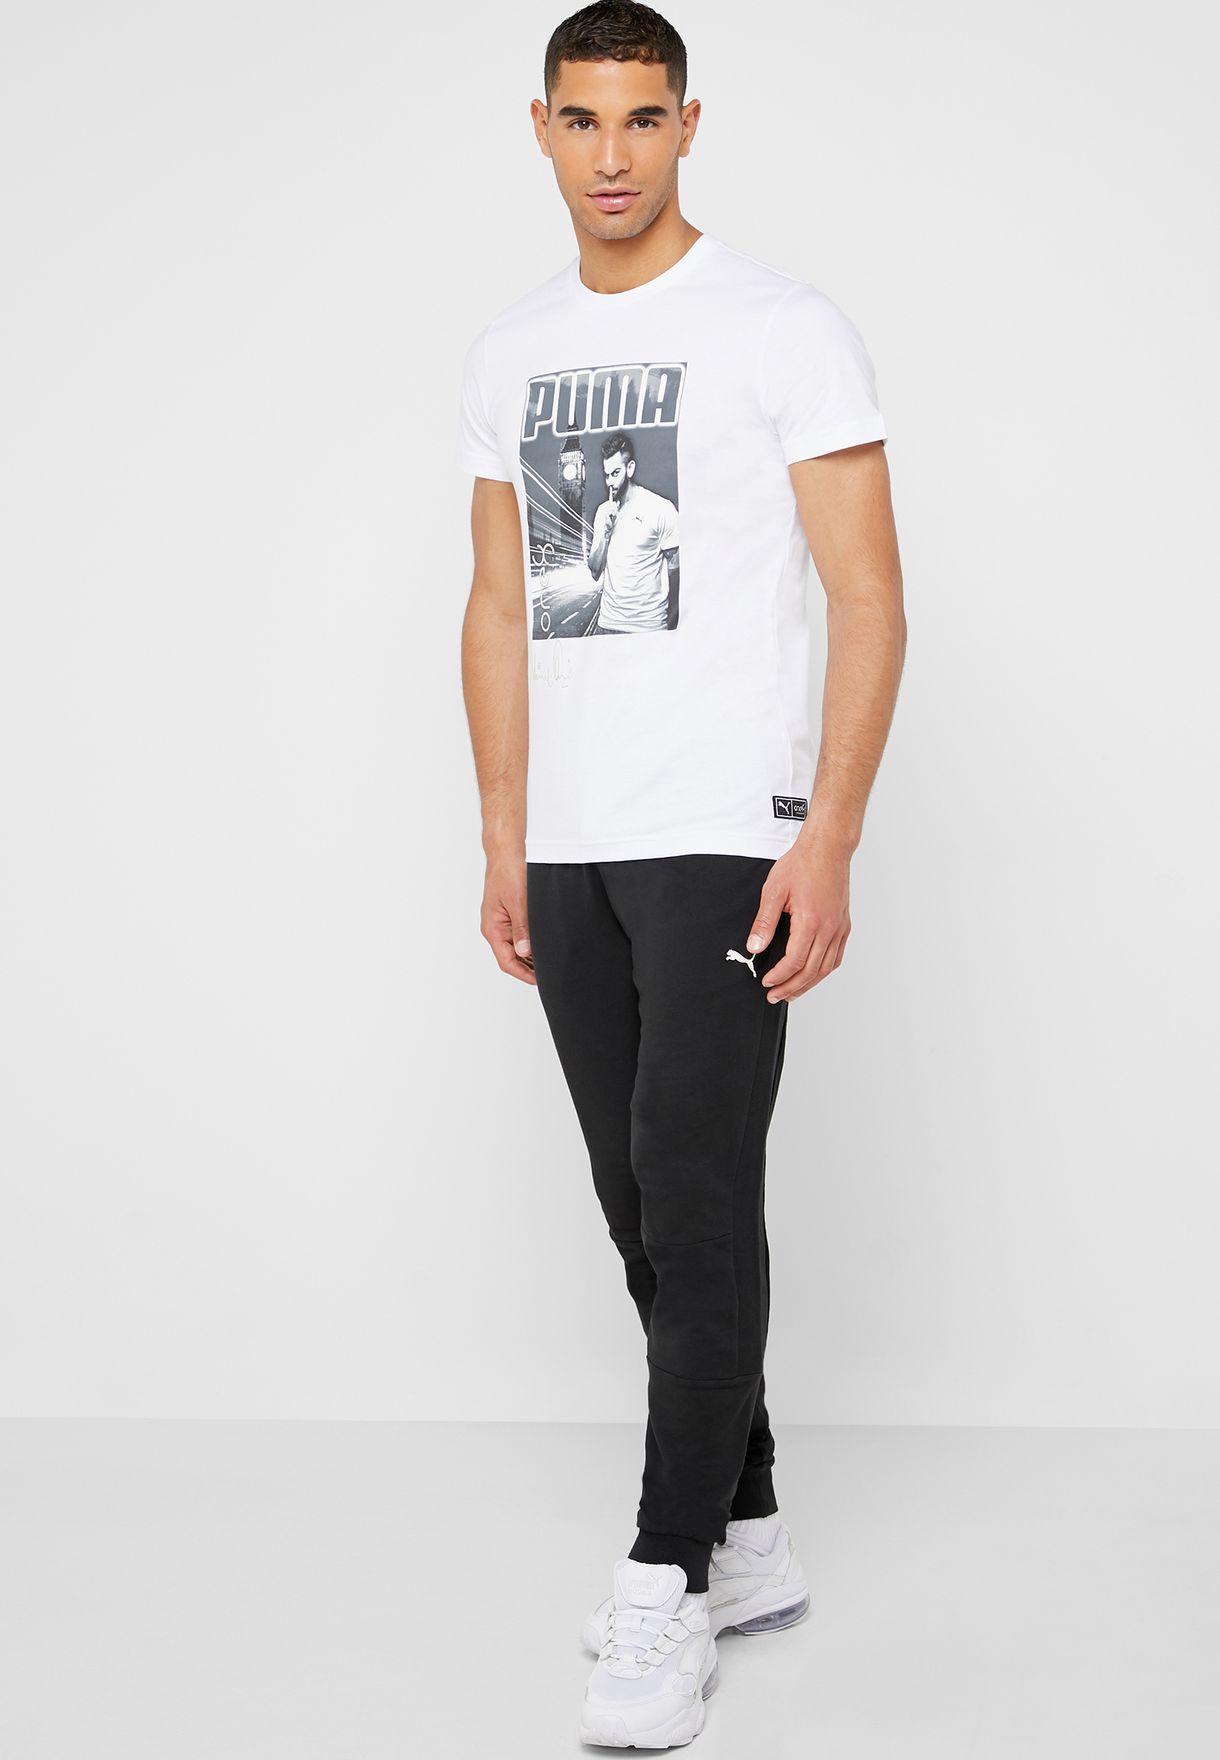 Virat Kohli Graphic T-Shirt